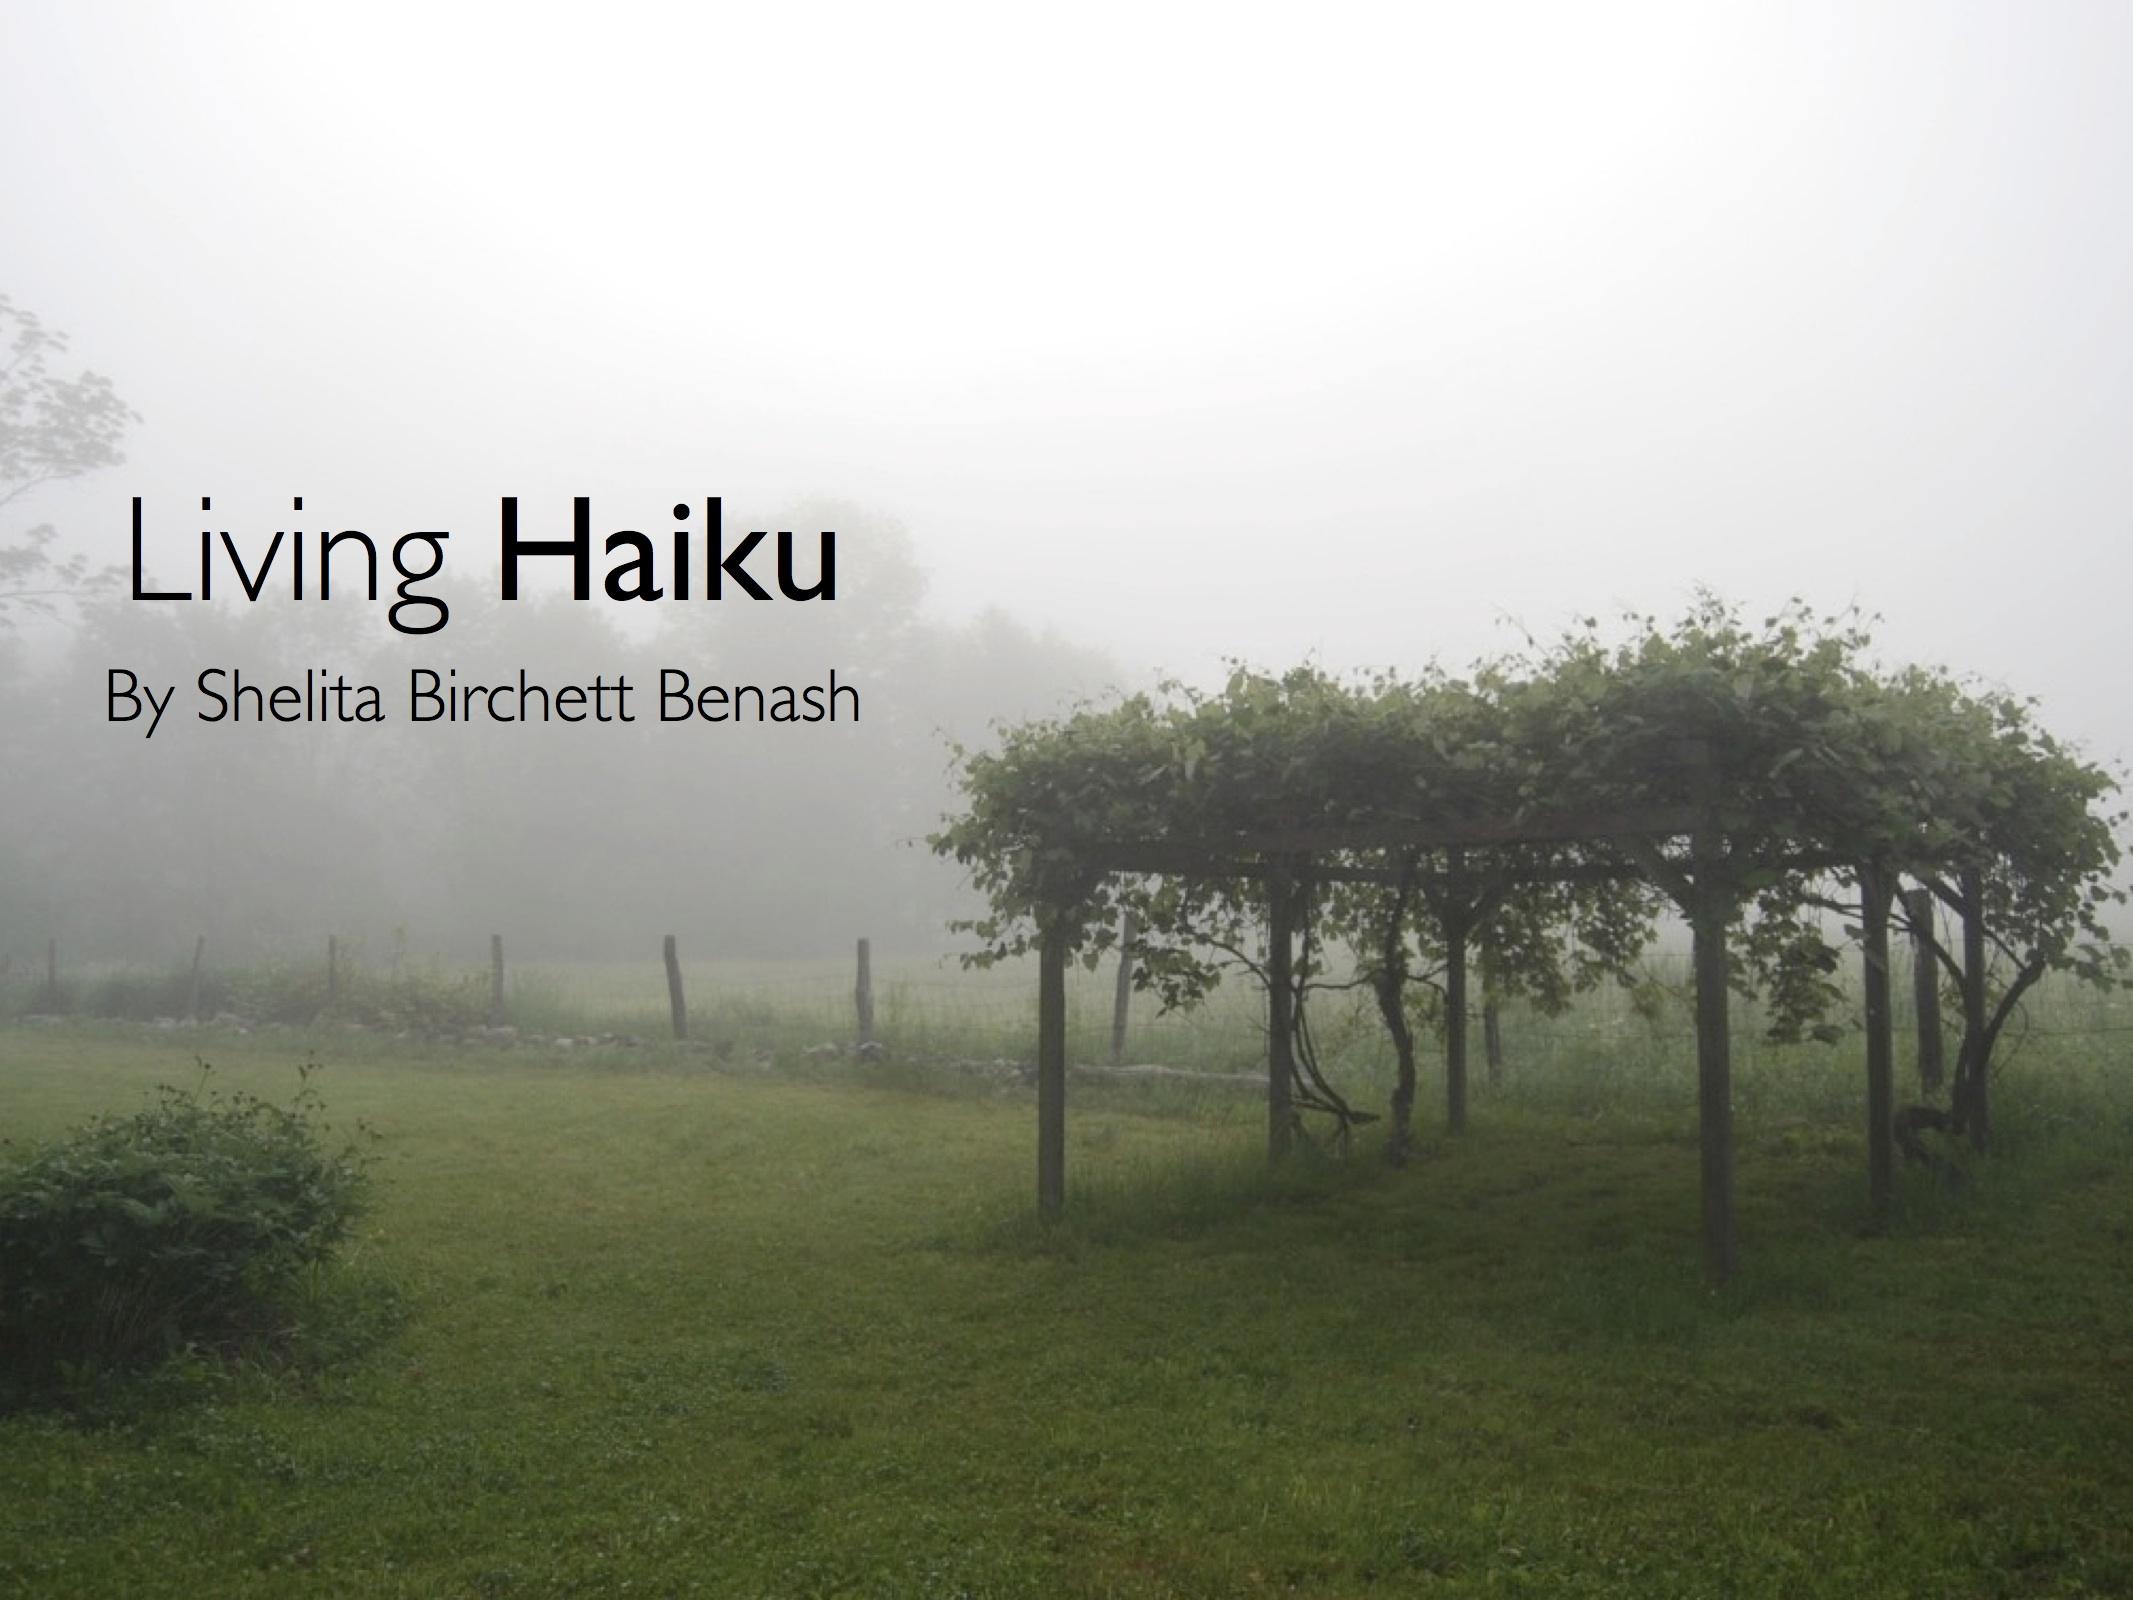 Photograph and haiku by Shelita Birchett Benash